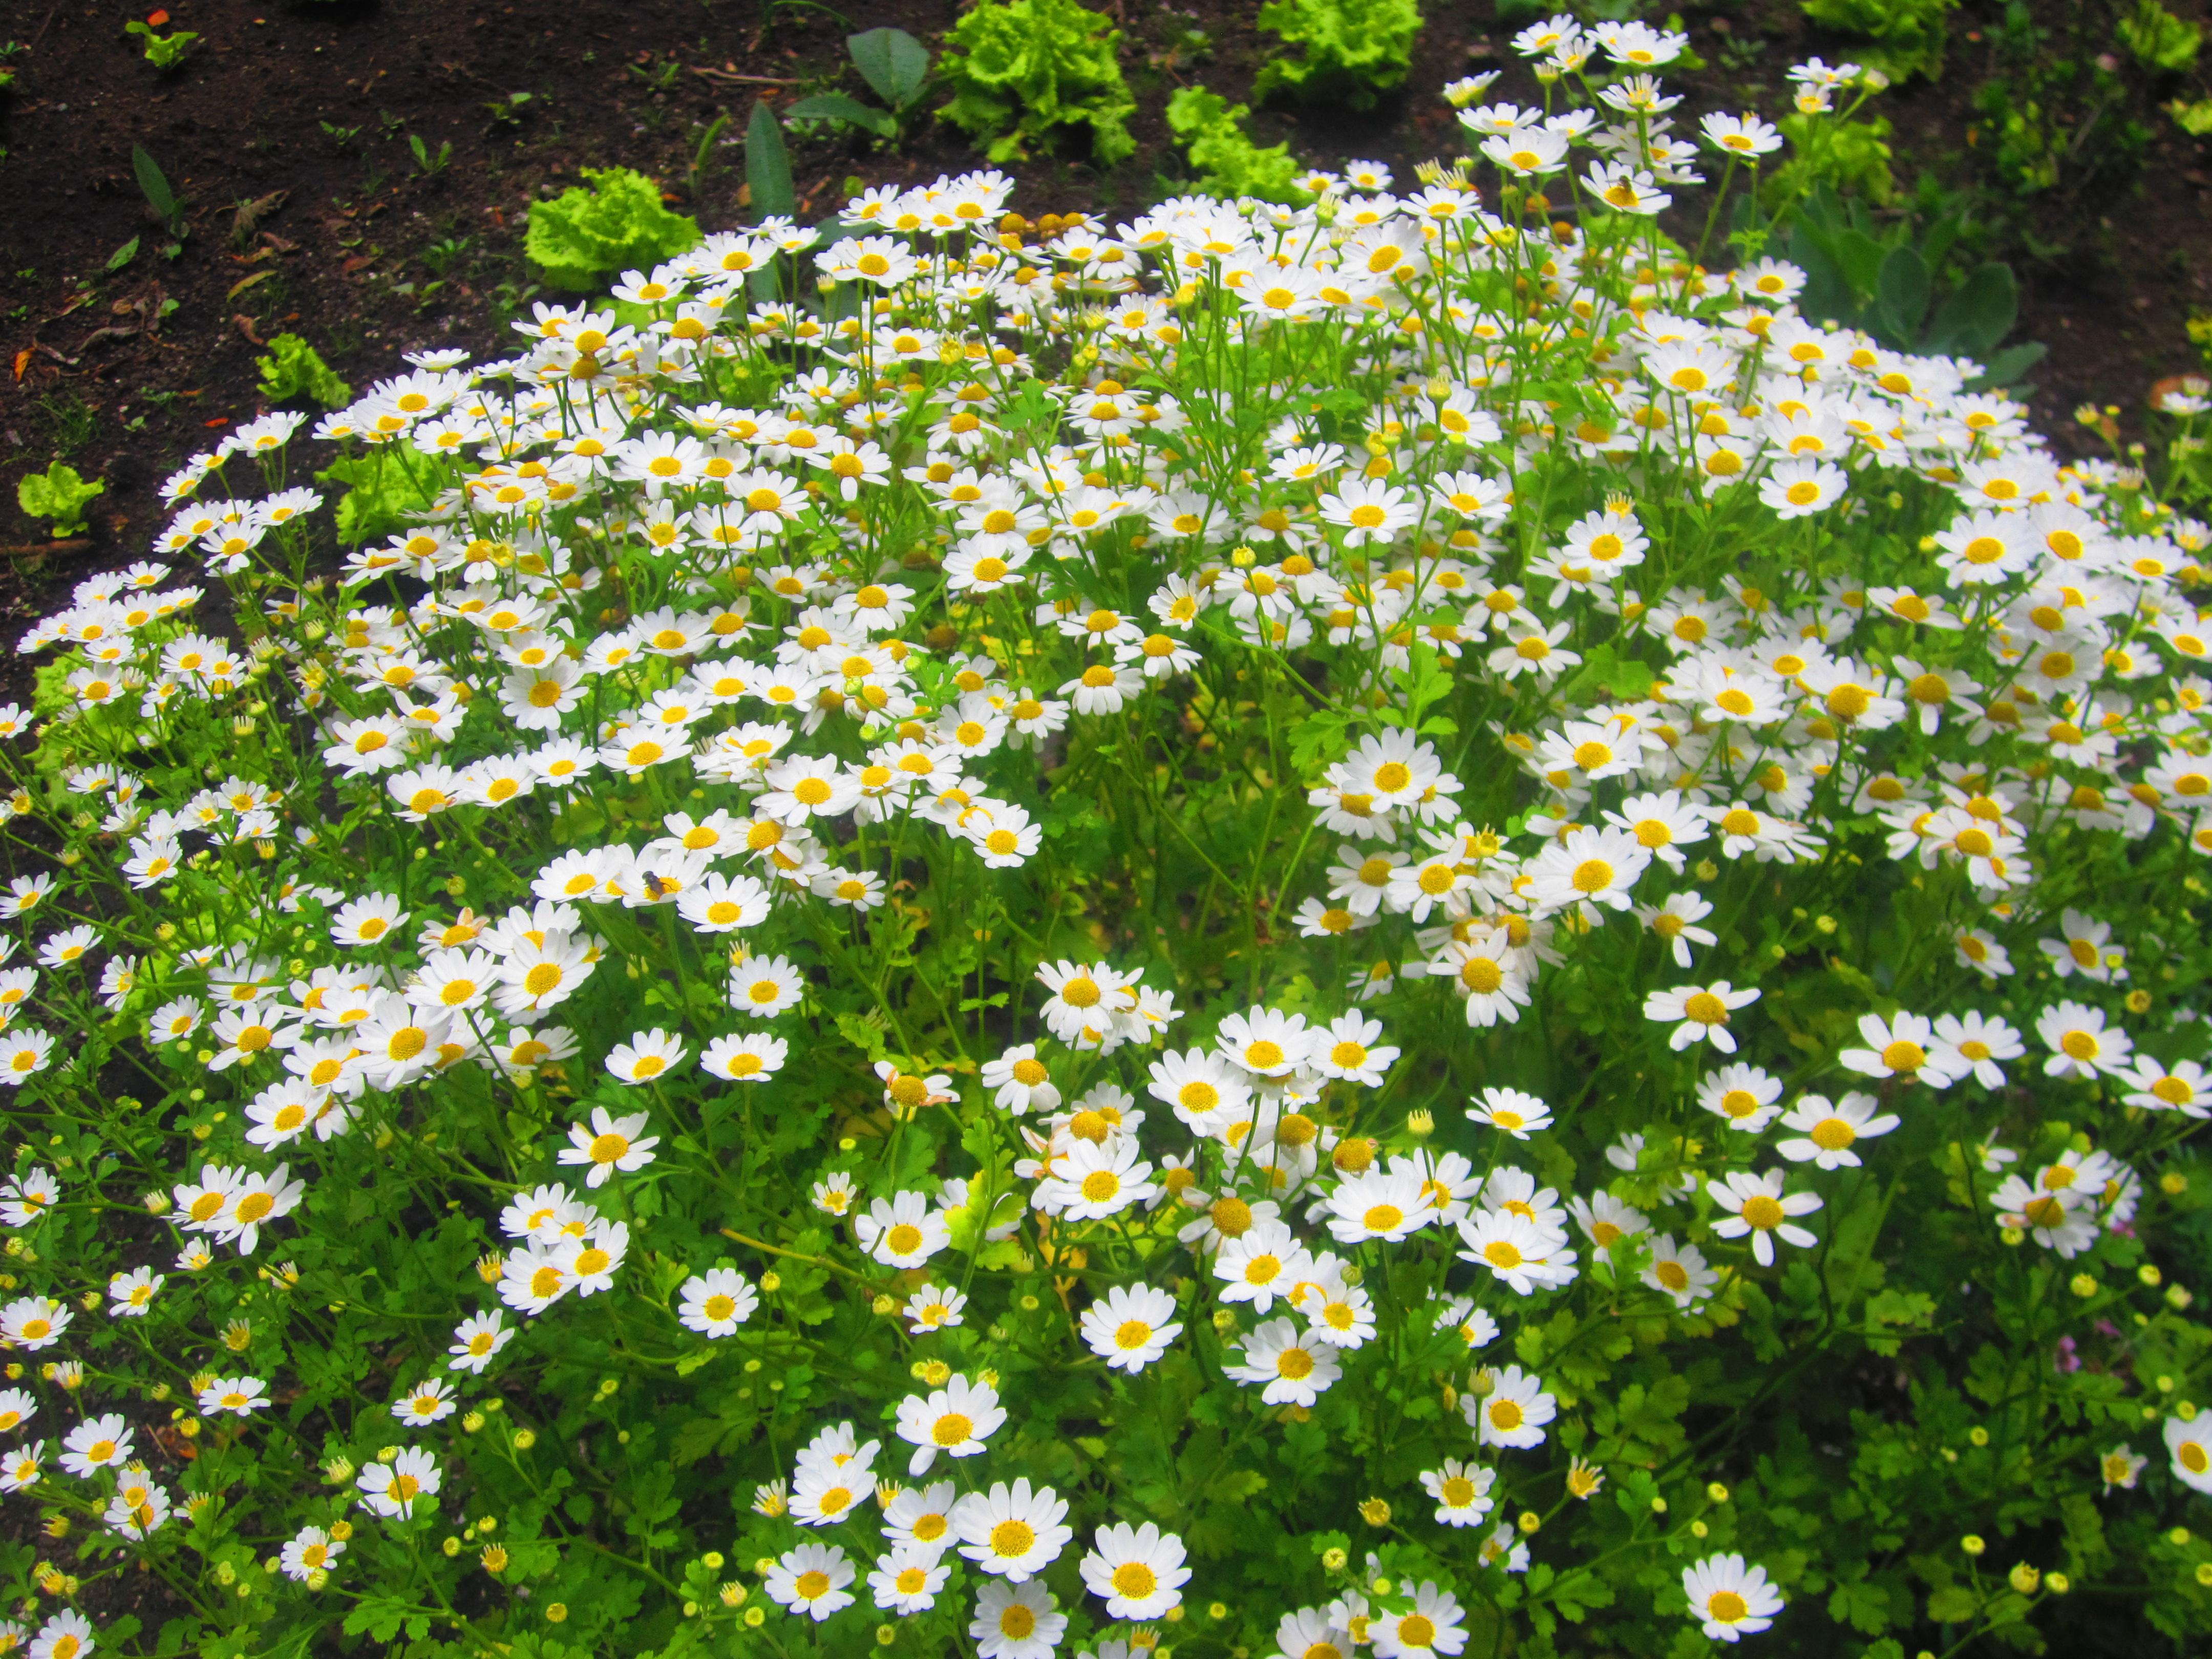 Jardin de flores gallery for Casa jardin